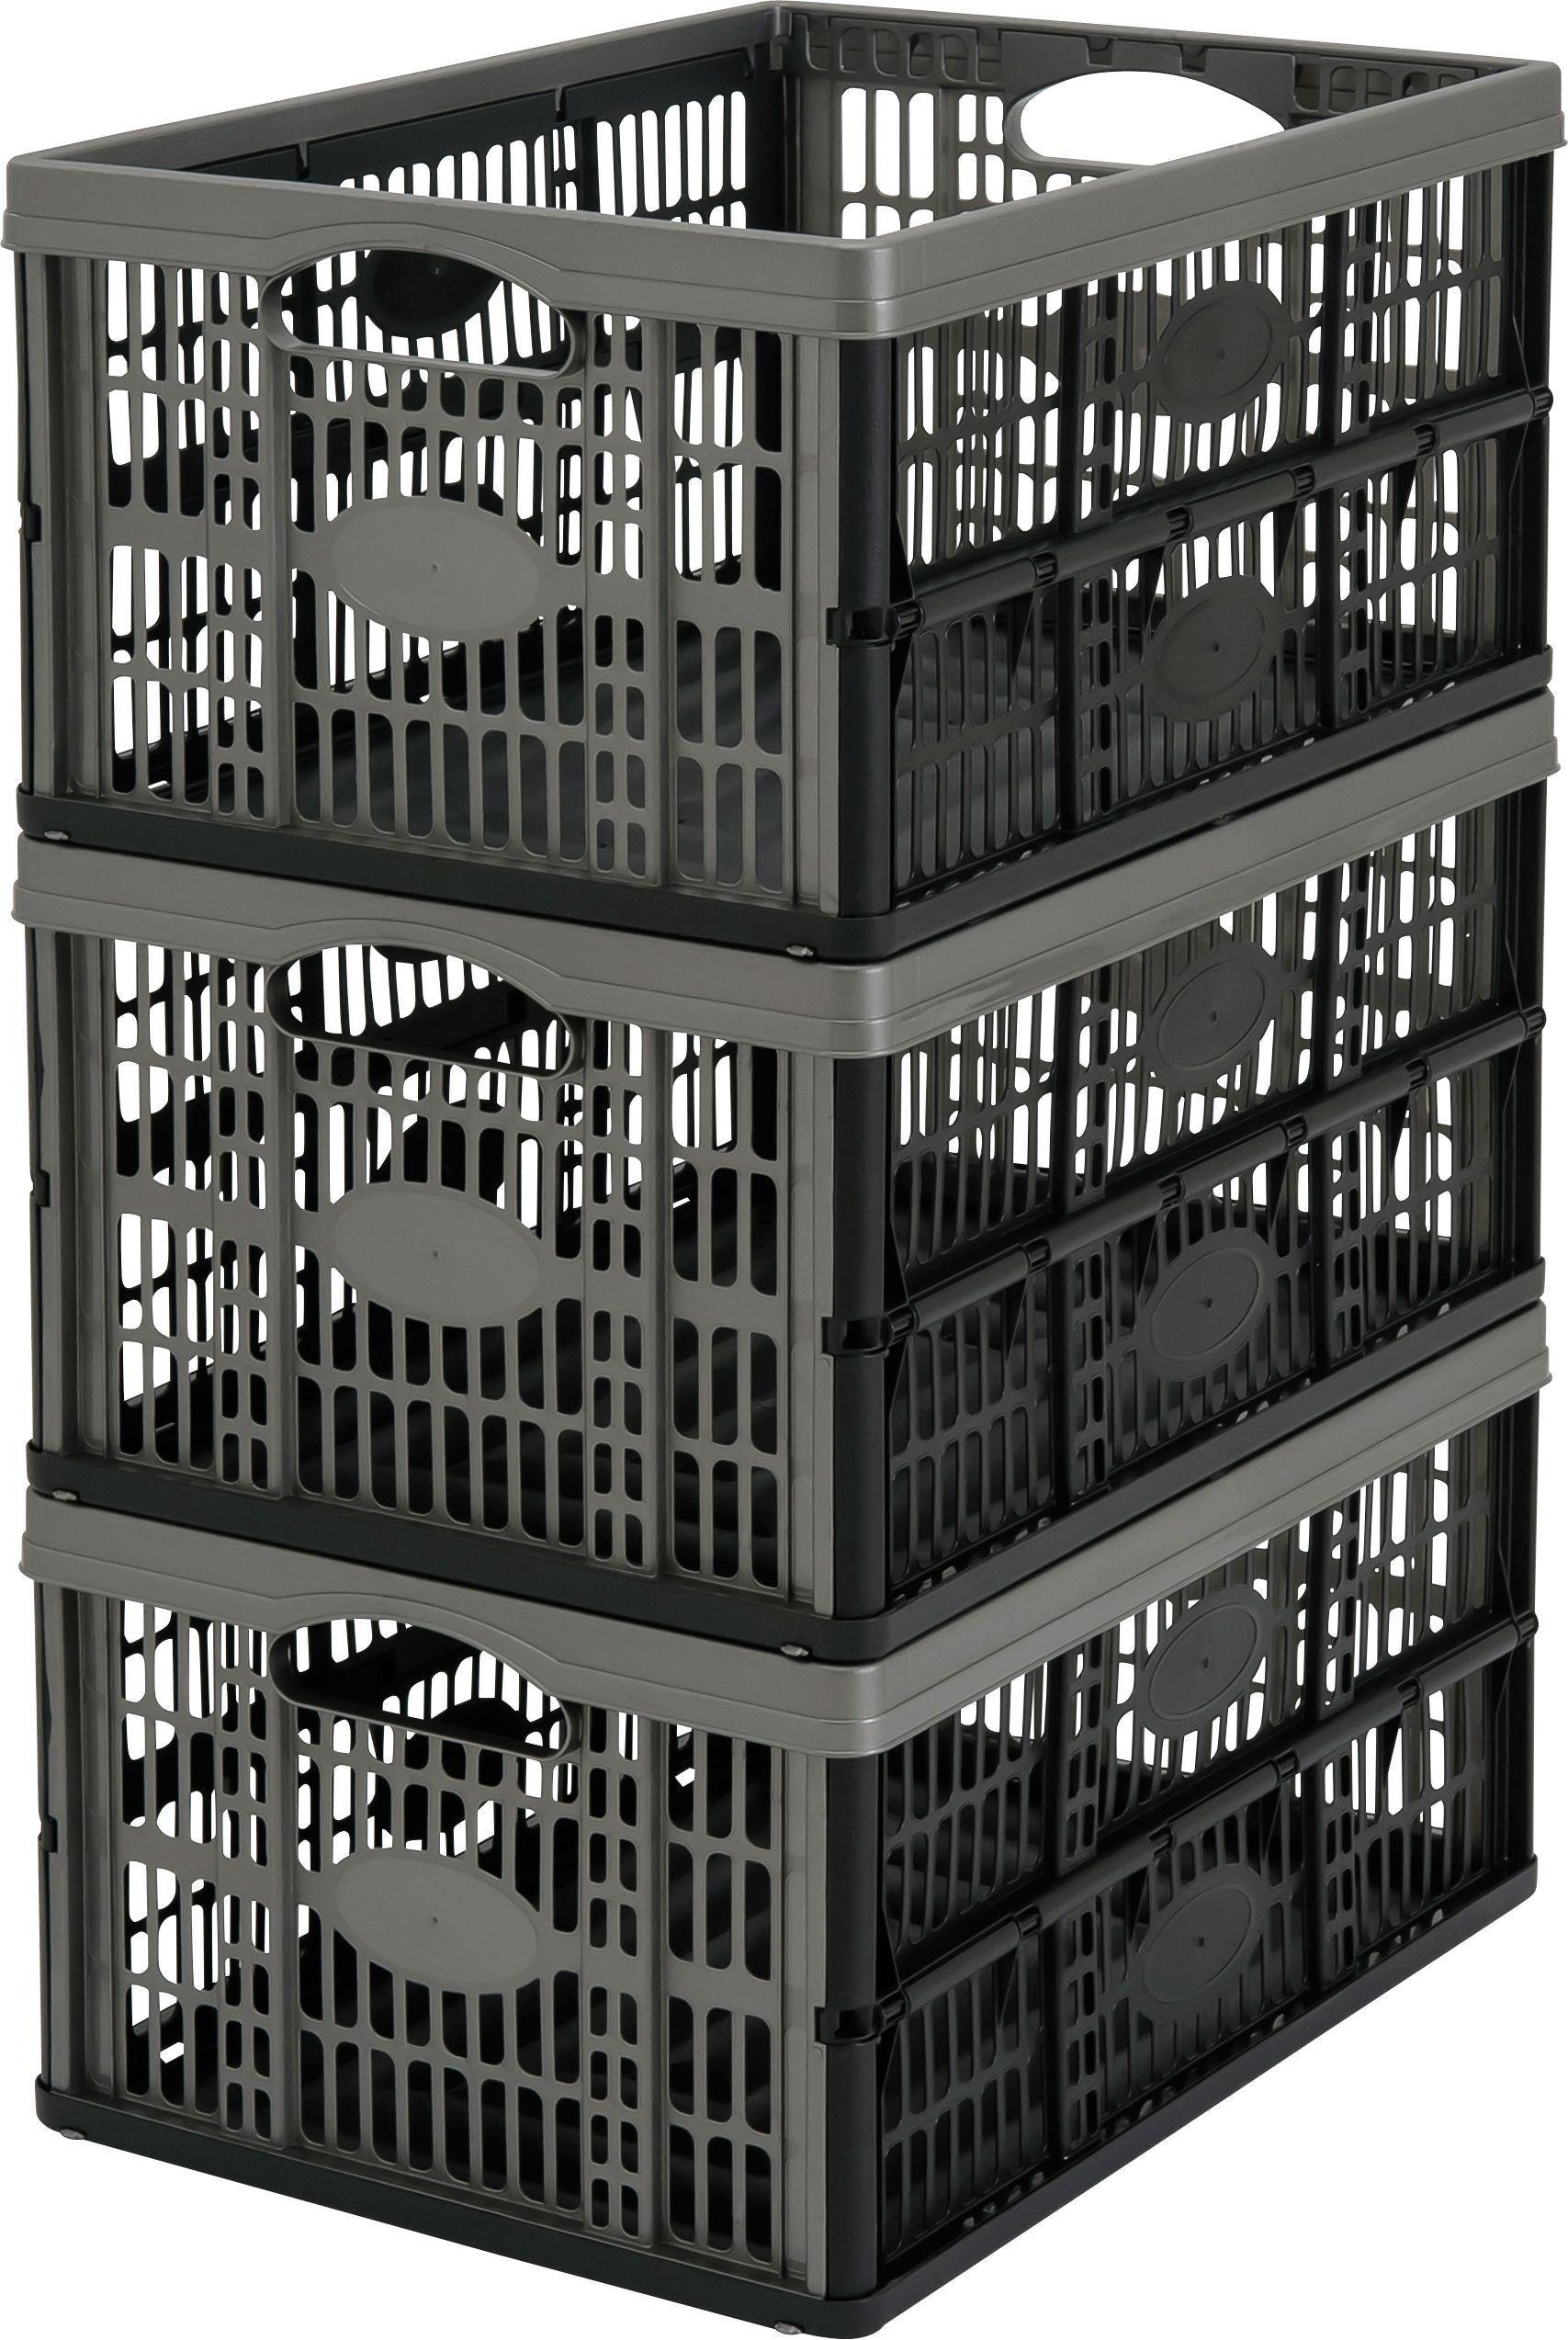 Argos Home 32 Lt Plastic Folding Storage Crates - Set of 3